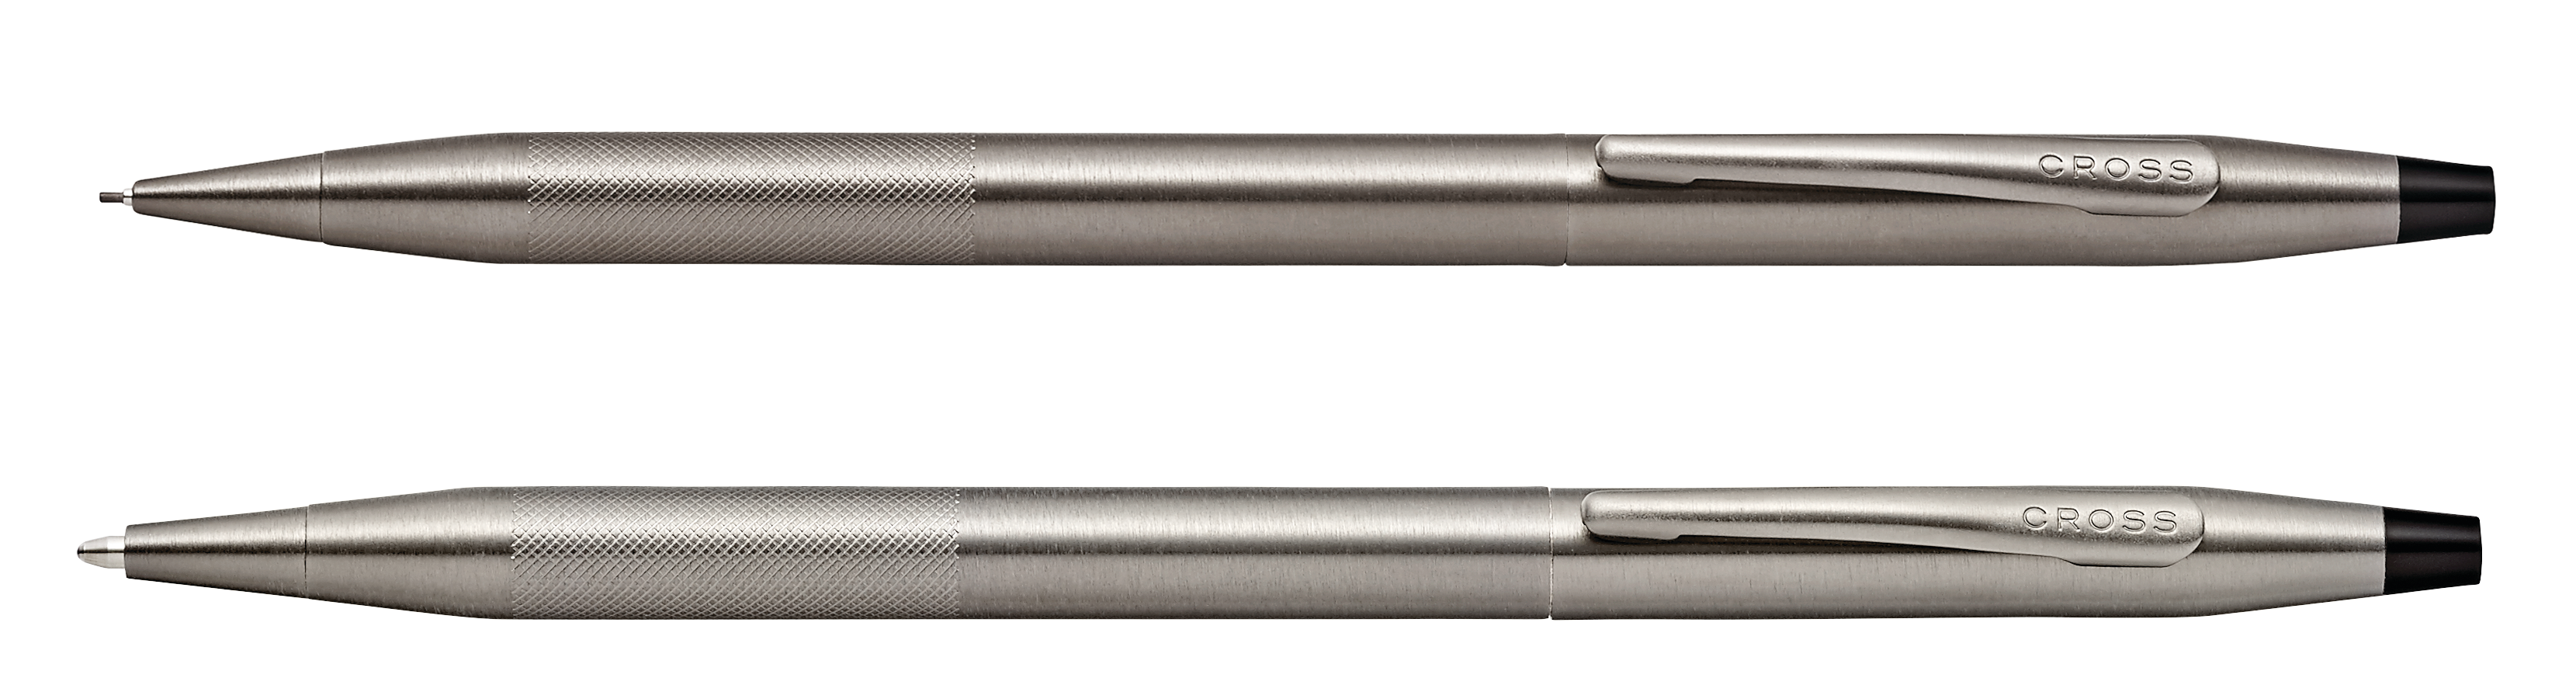 Classic Century Titanium Gray Pen and Pencil Set with Micro-knurl Detail